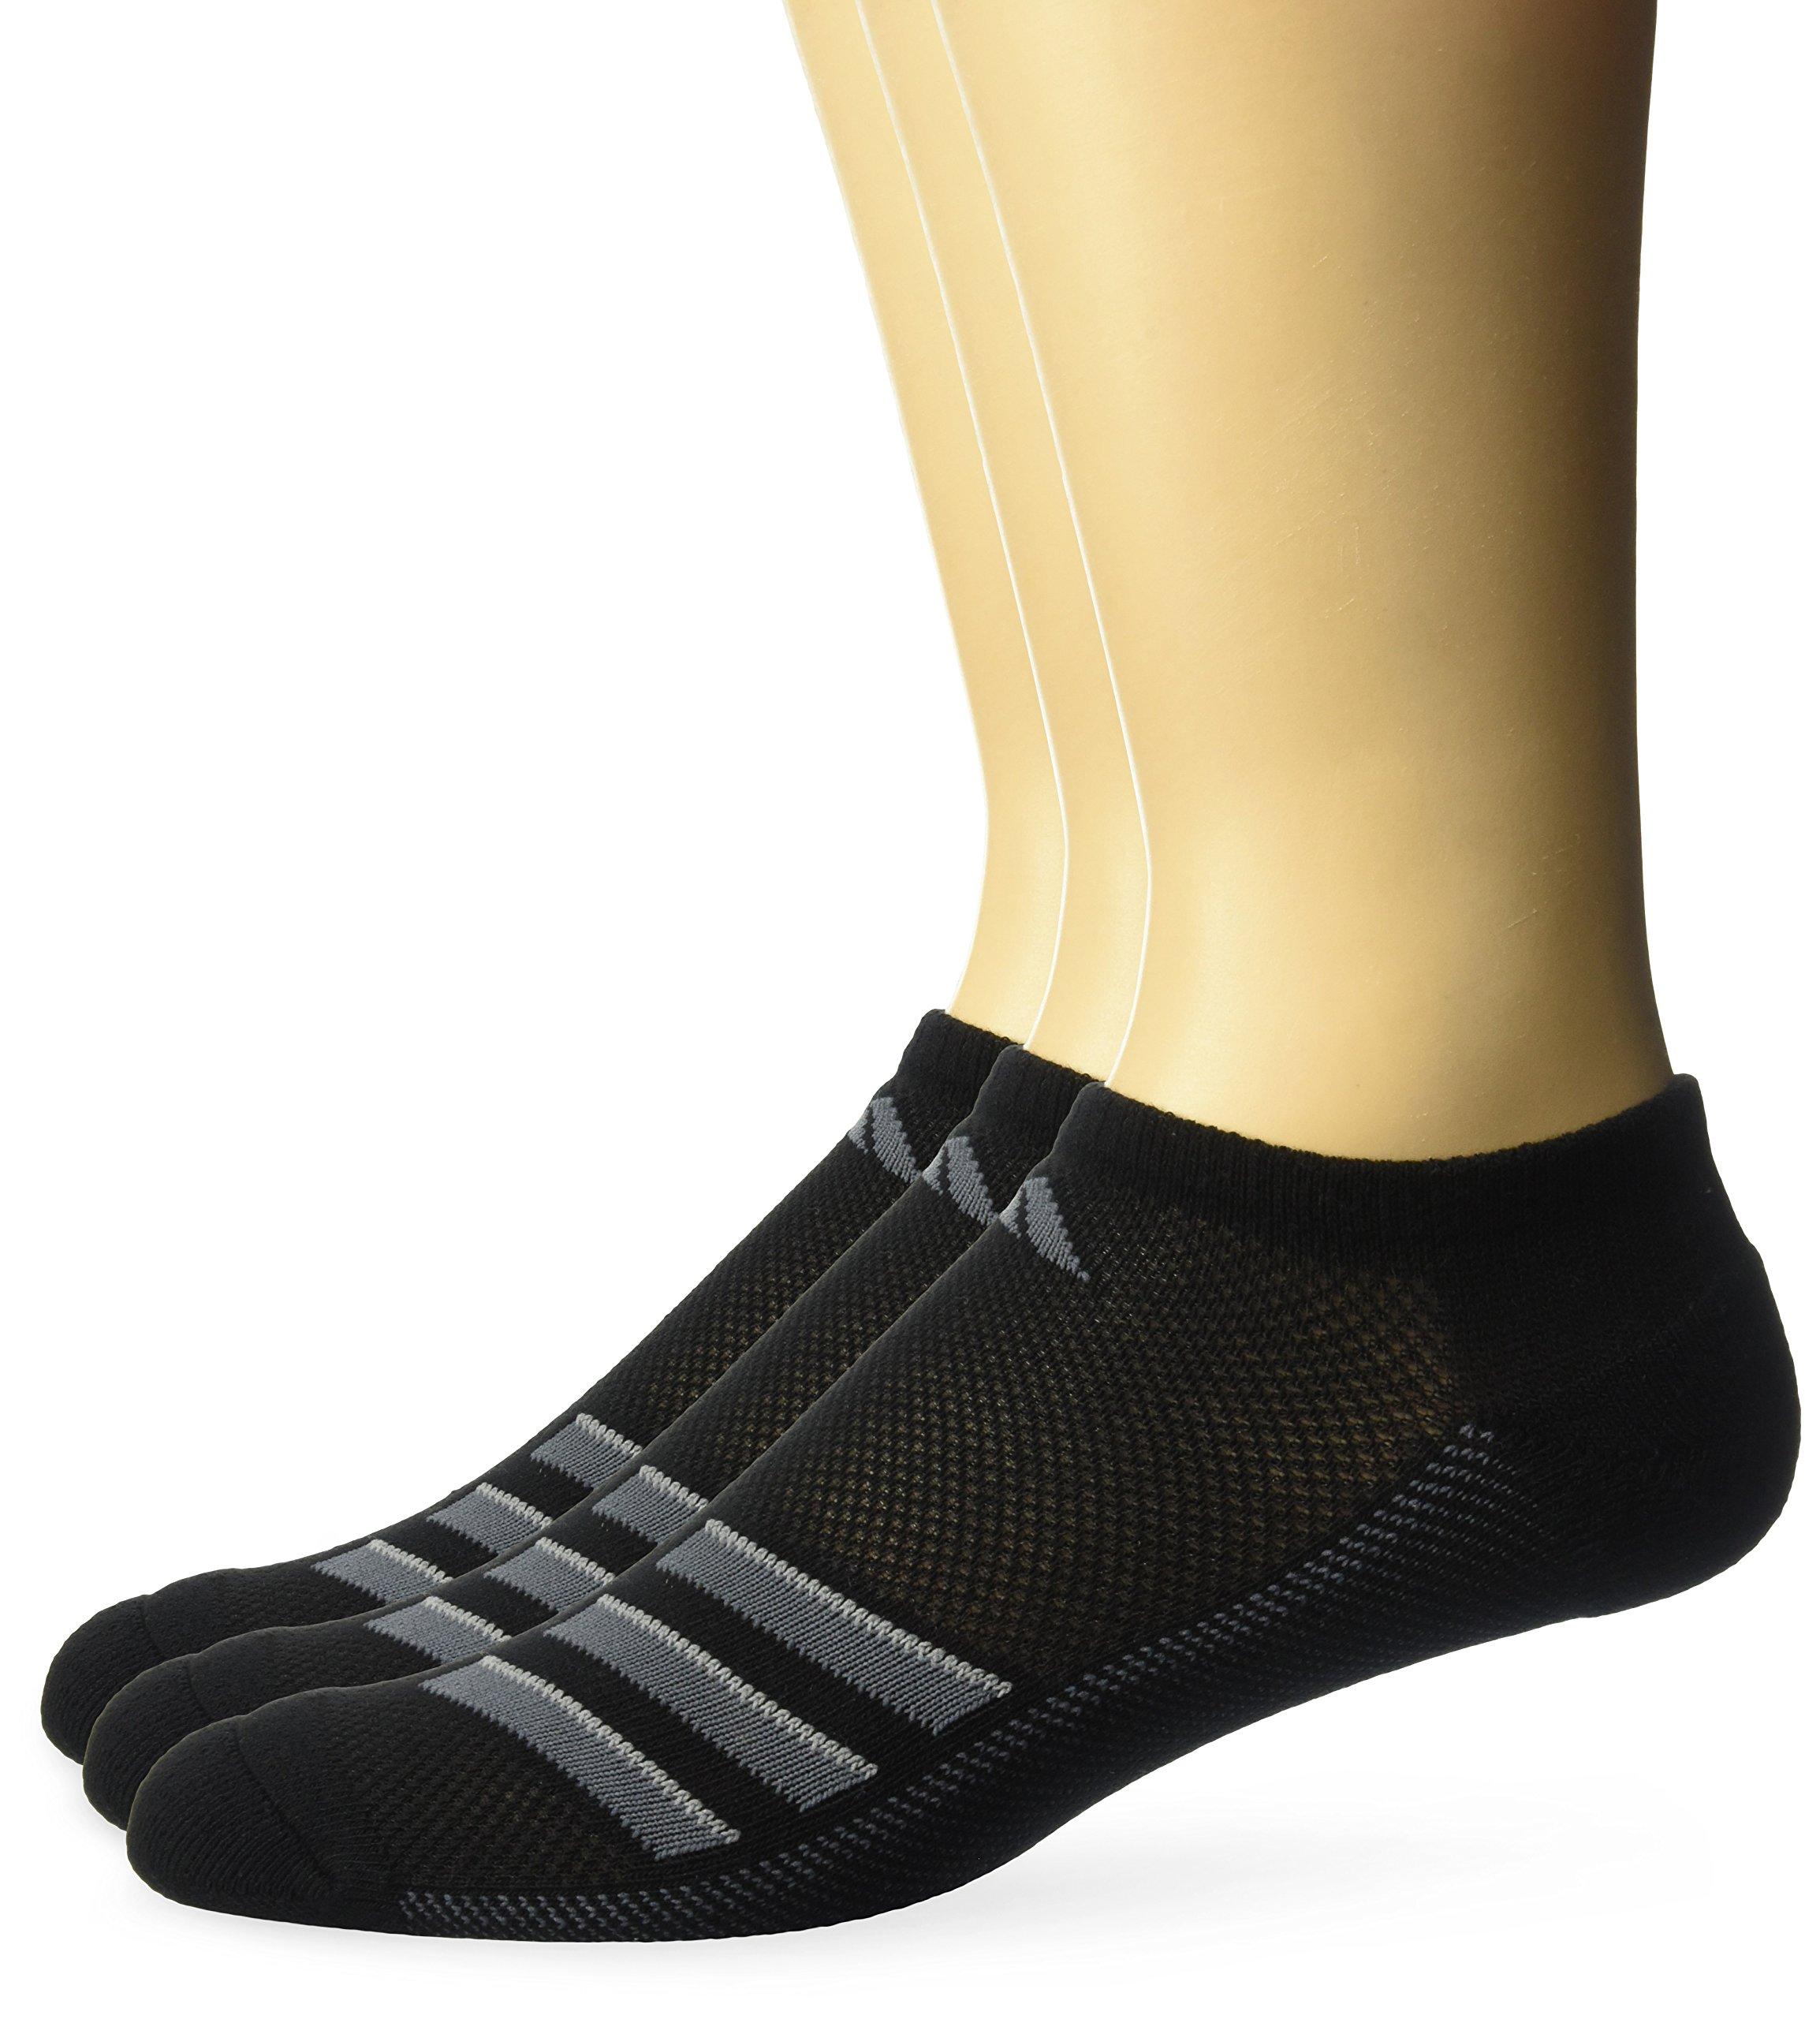 adidas Men's Climacool Superlite No Show Socks (3-Pack), Black/Onix/Light Onix, Size 6-12